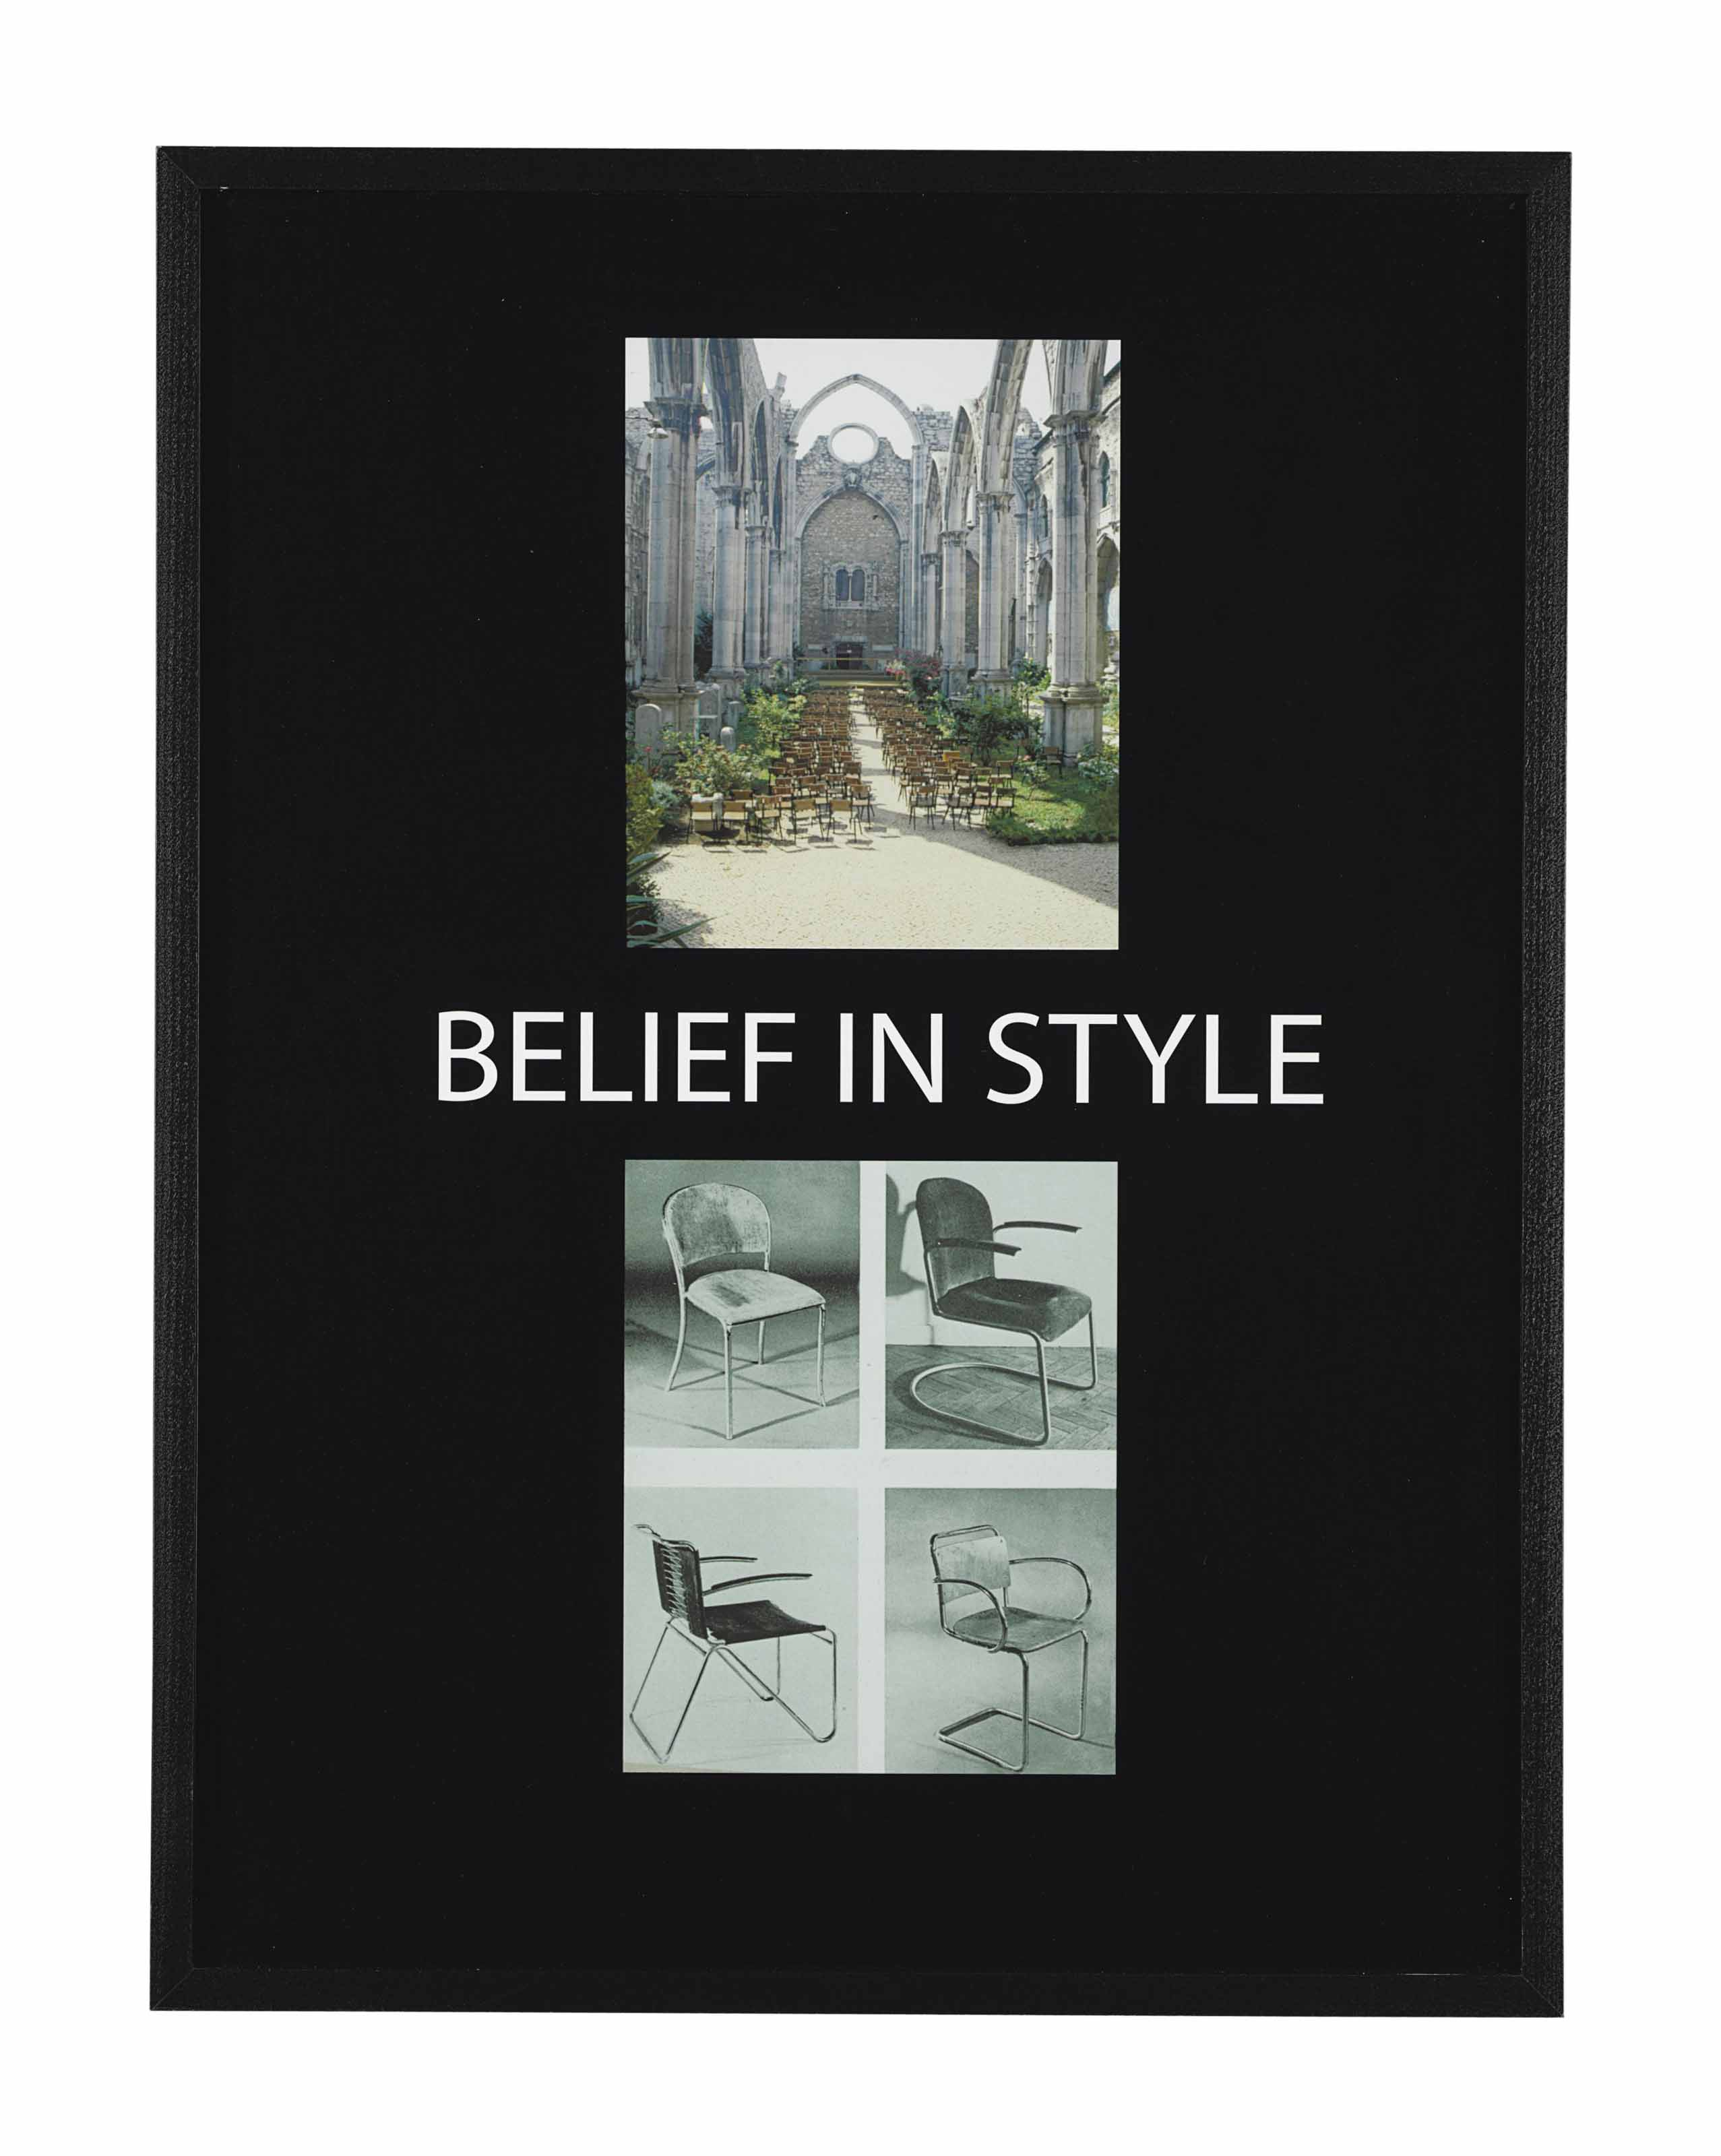 Belief in Style